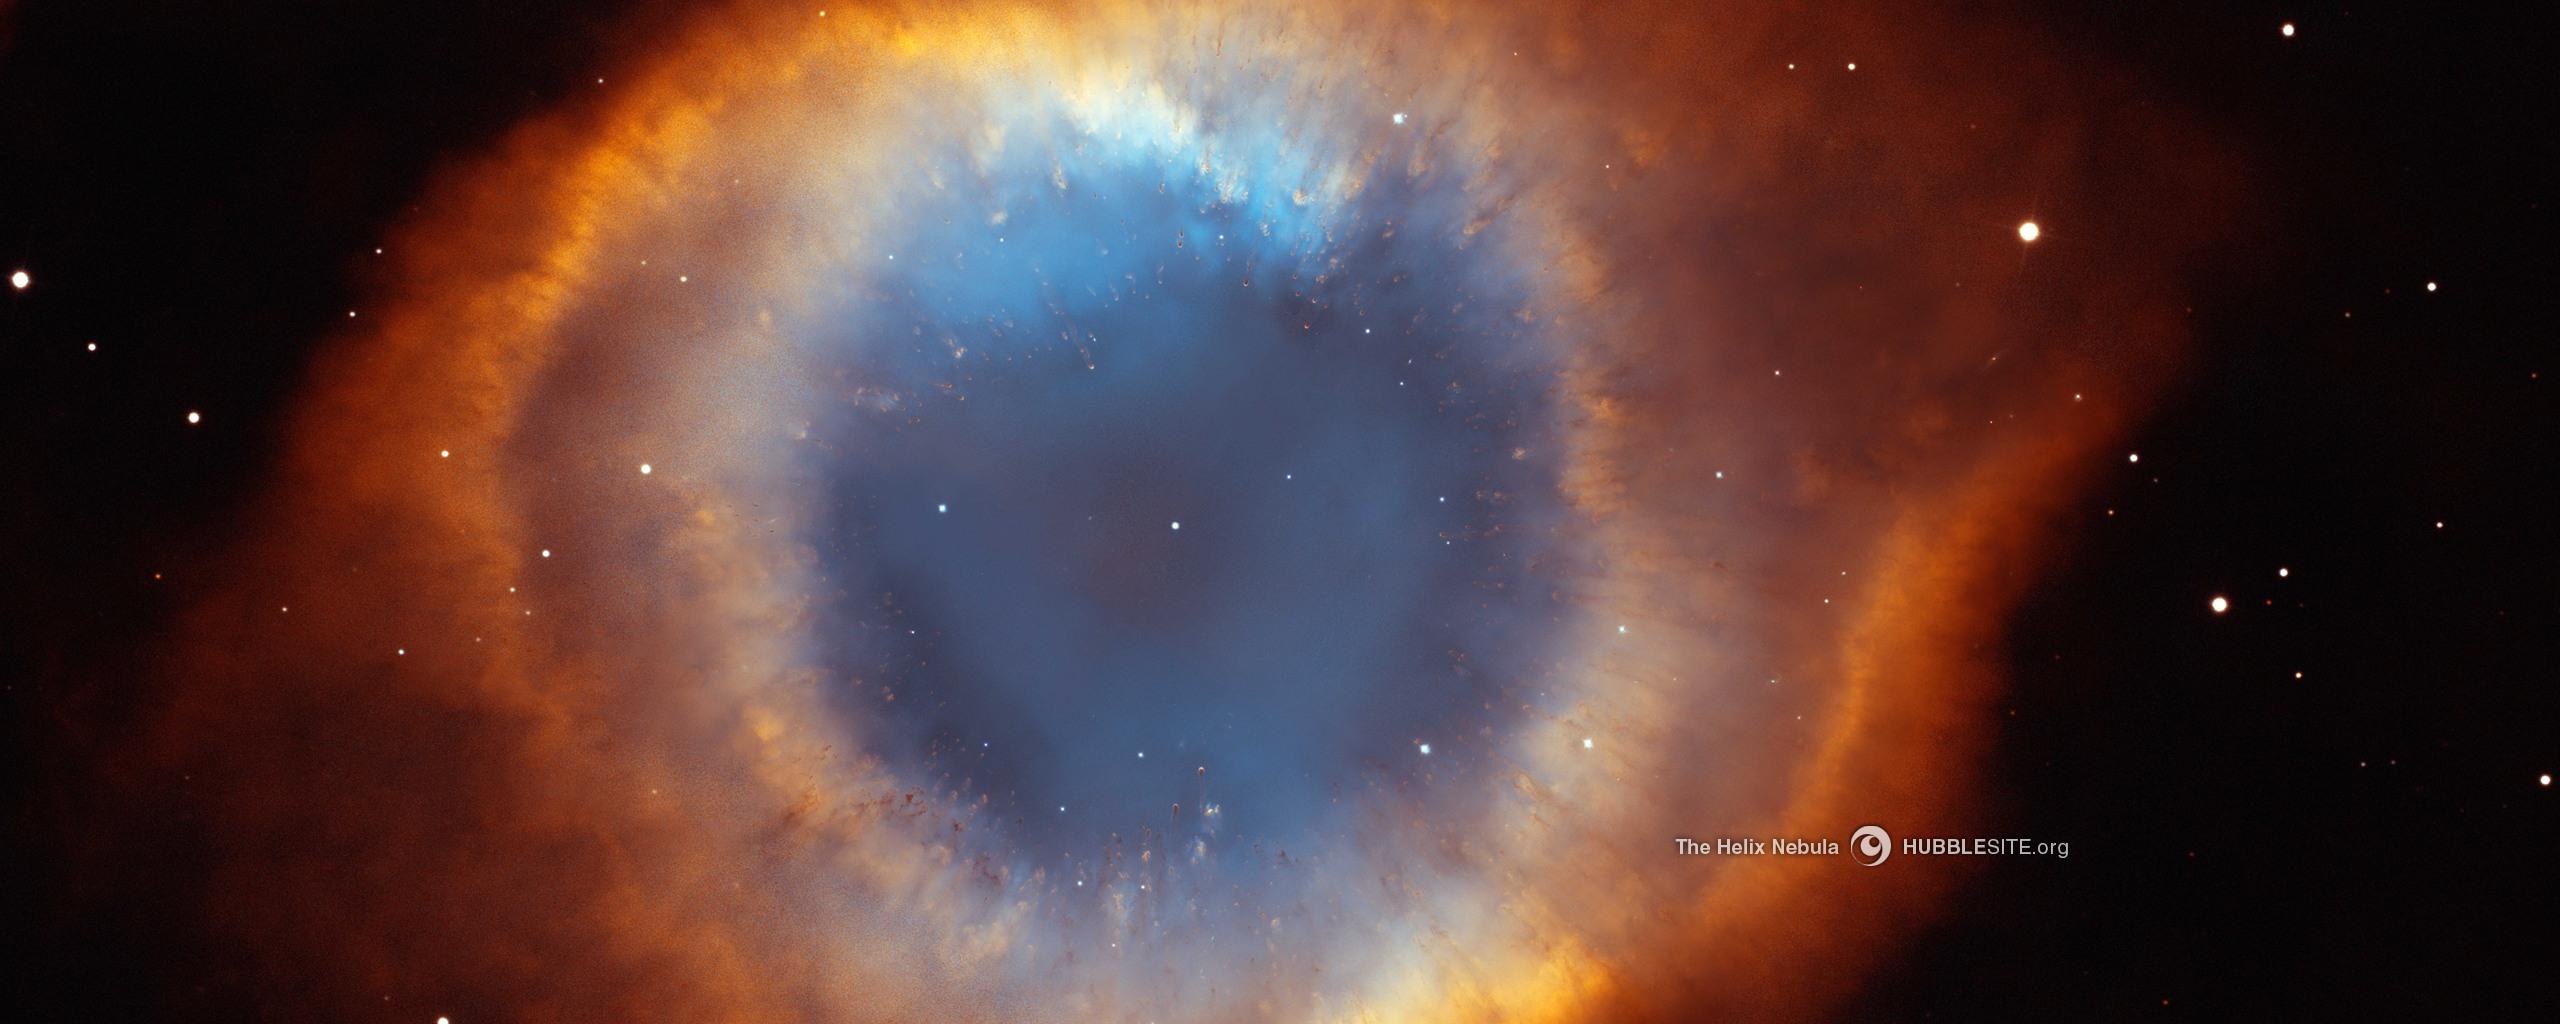 hourglass nebula wallpaper - photo #11